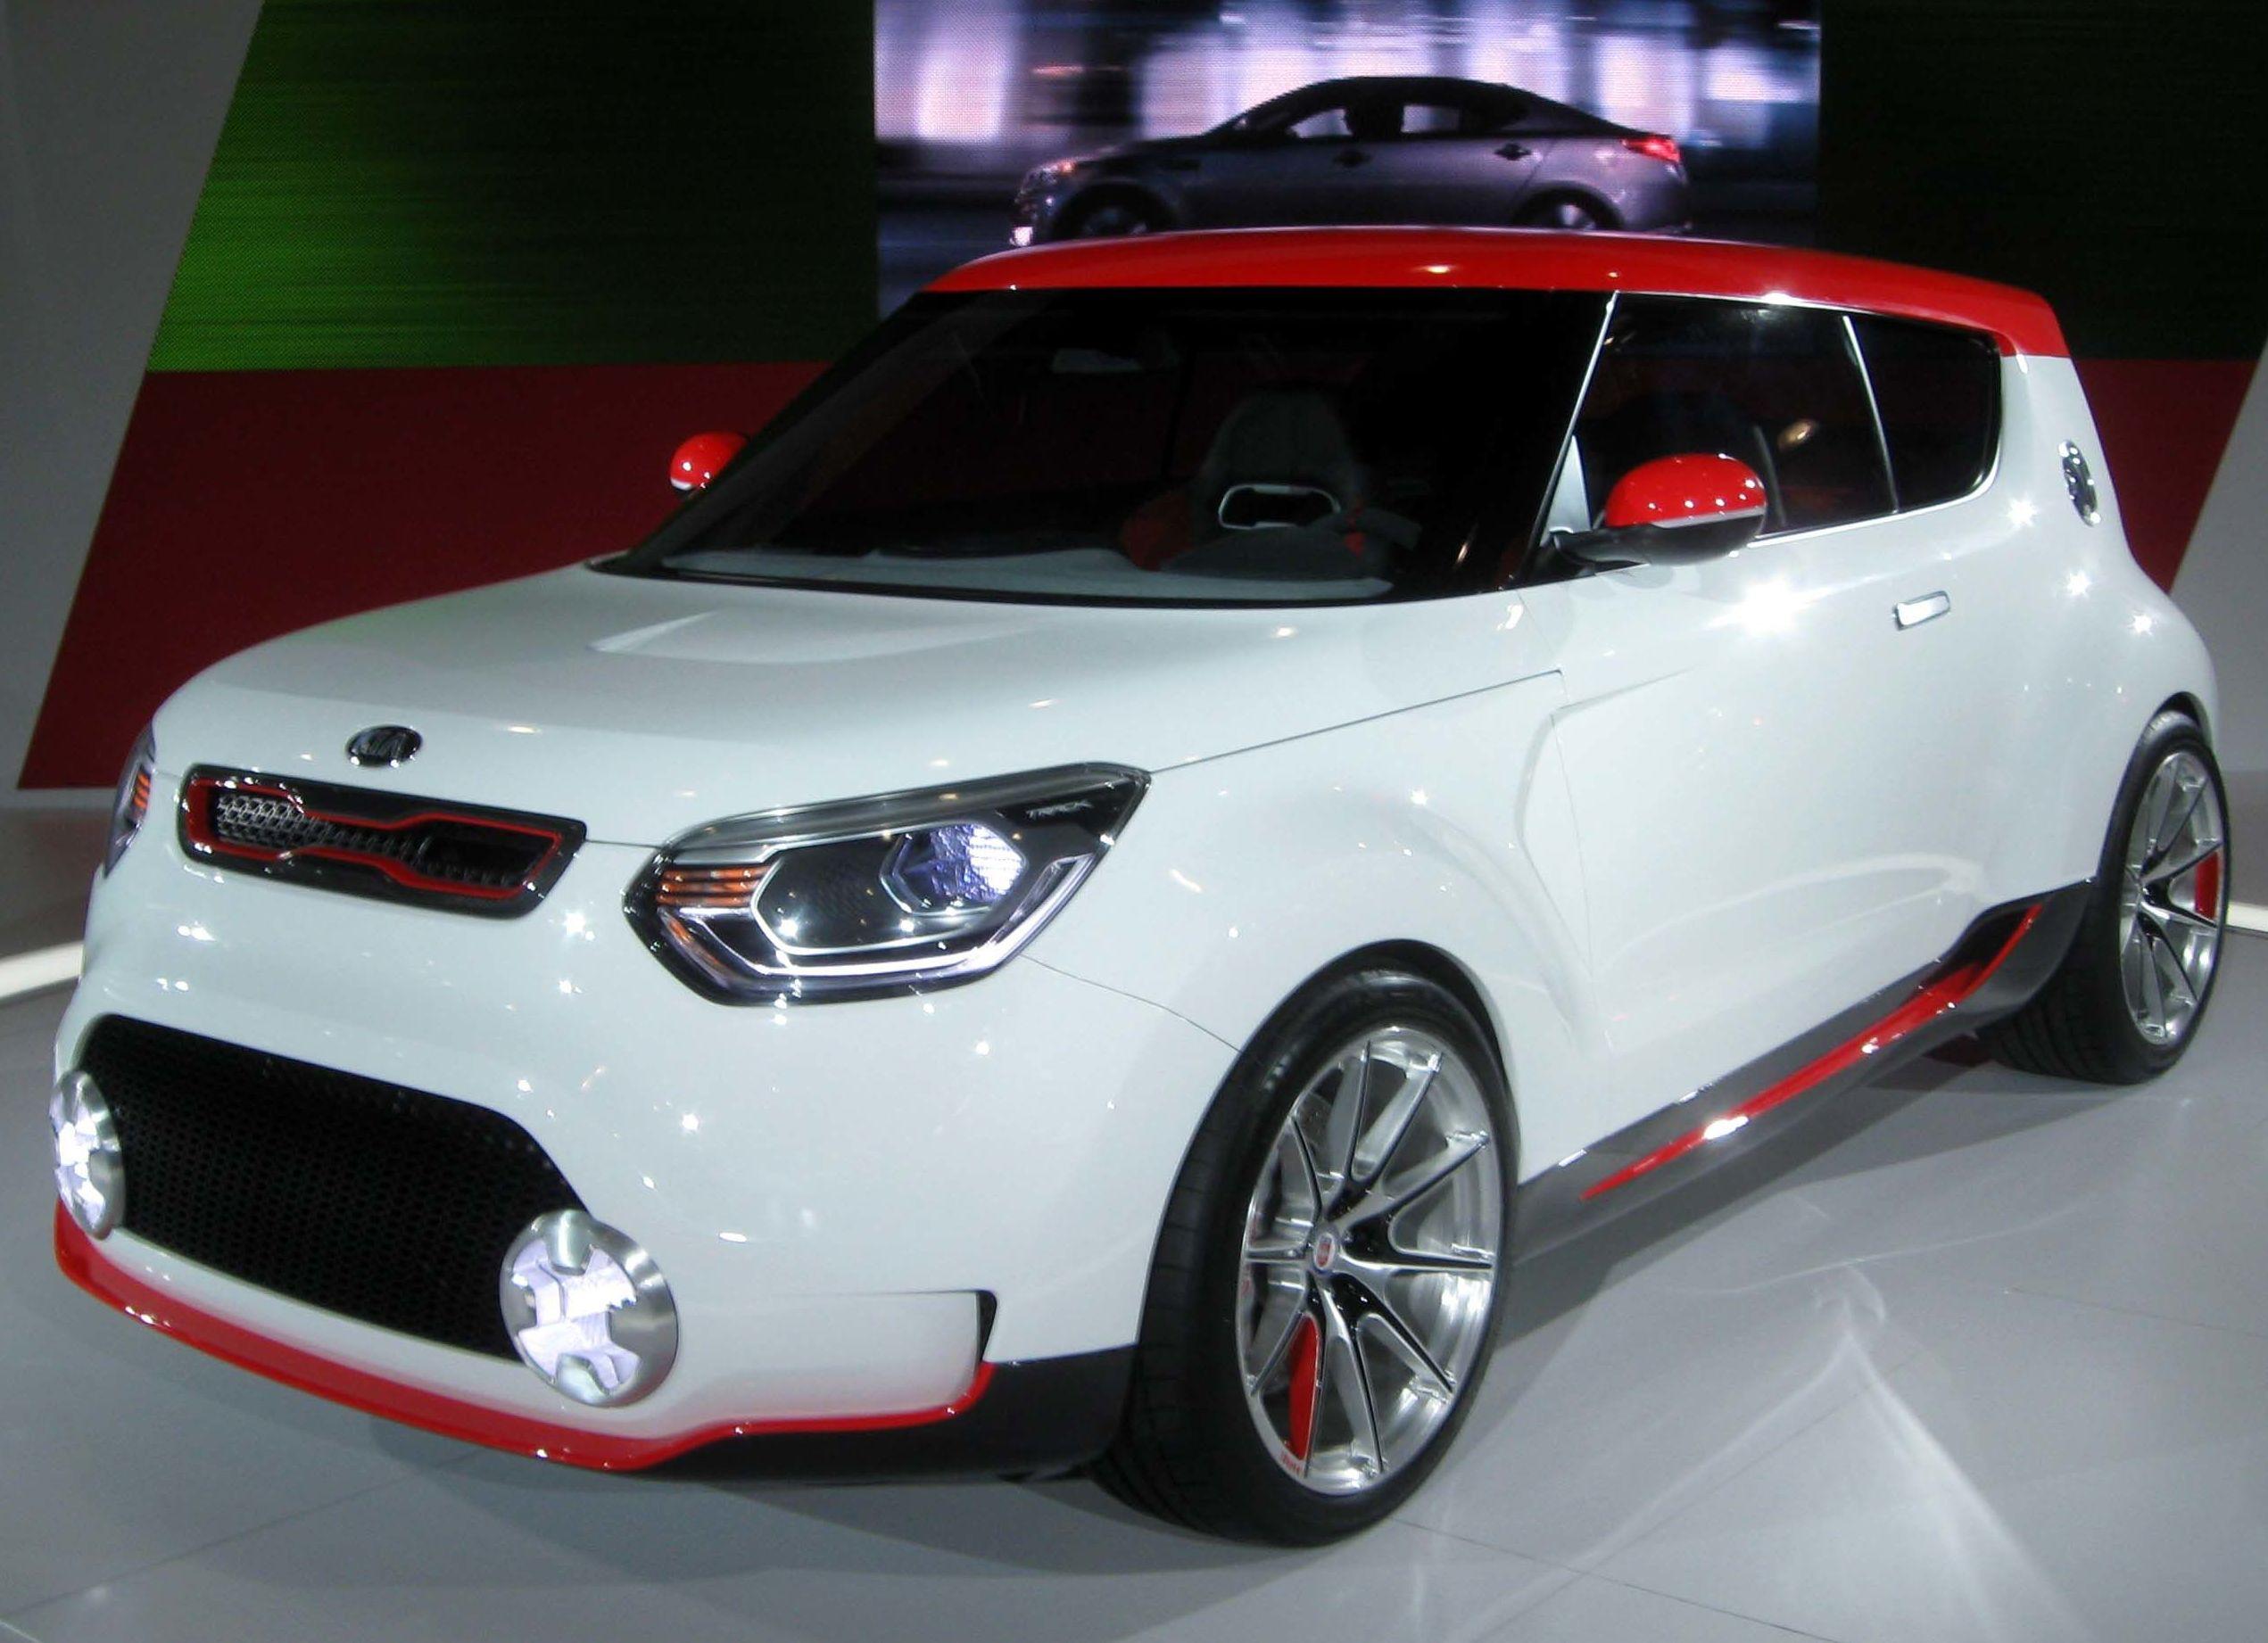 Concesionario Kia: Taller de automóvil  de Kolor Kar